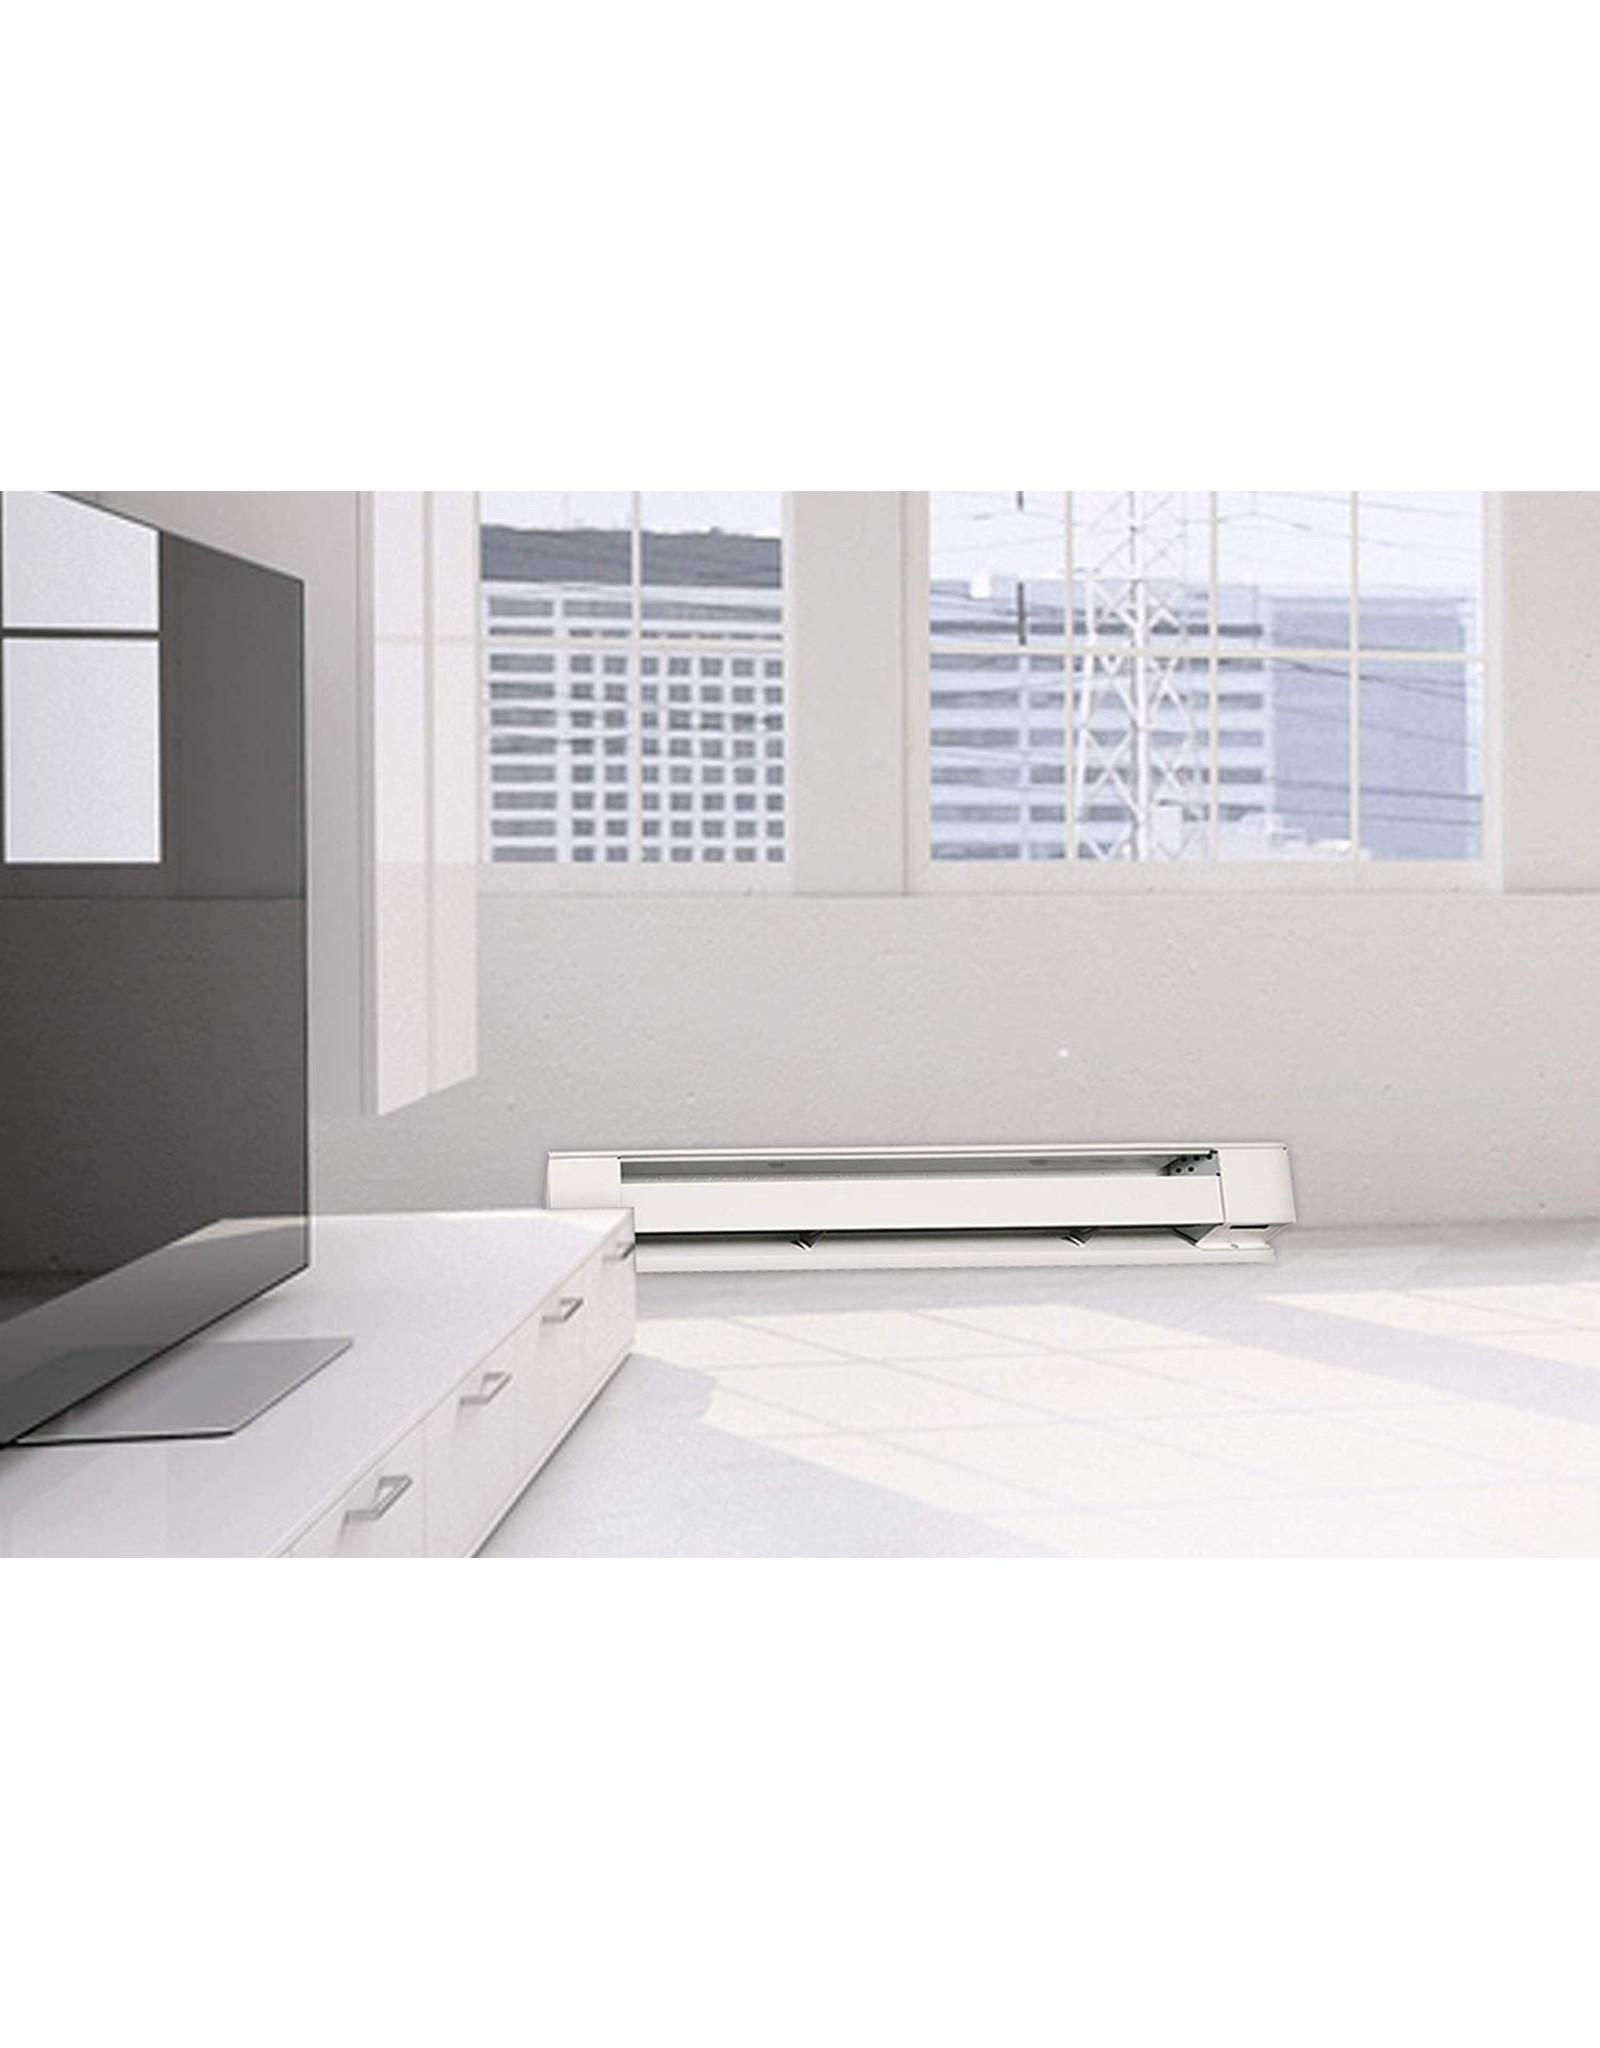 Fahrenheat Fahrenheat F2516 6' 120V BASEBOARD HEATER, White